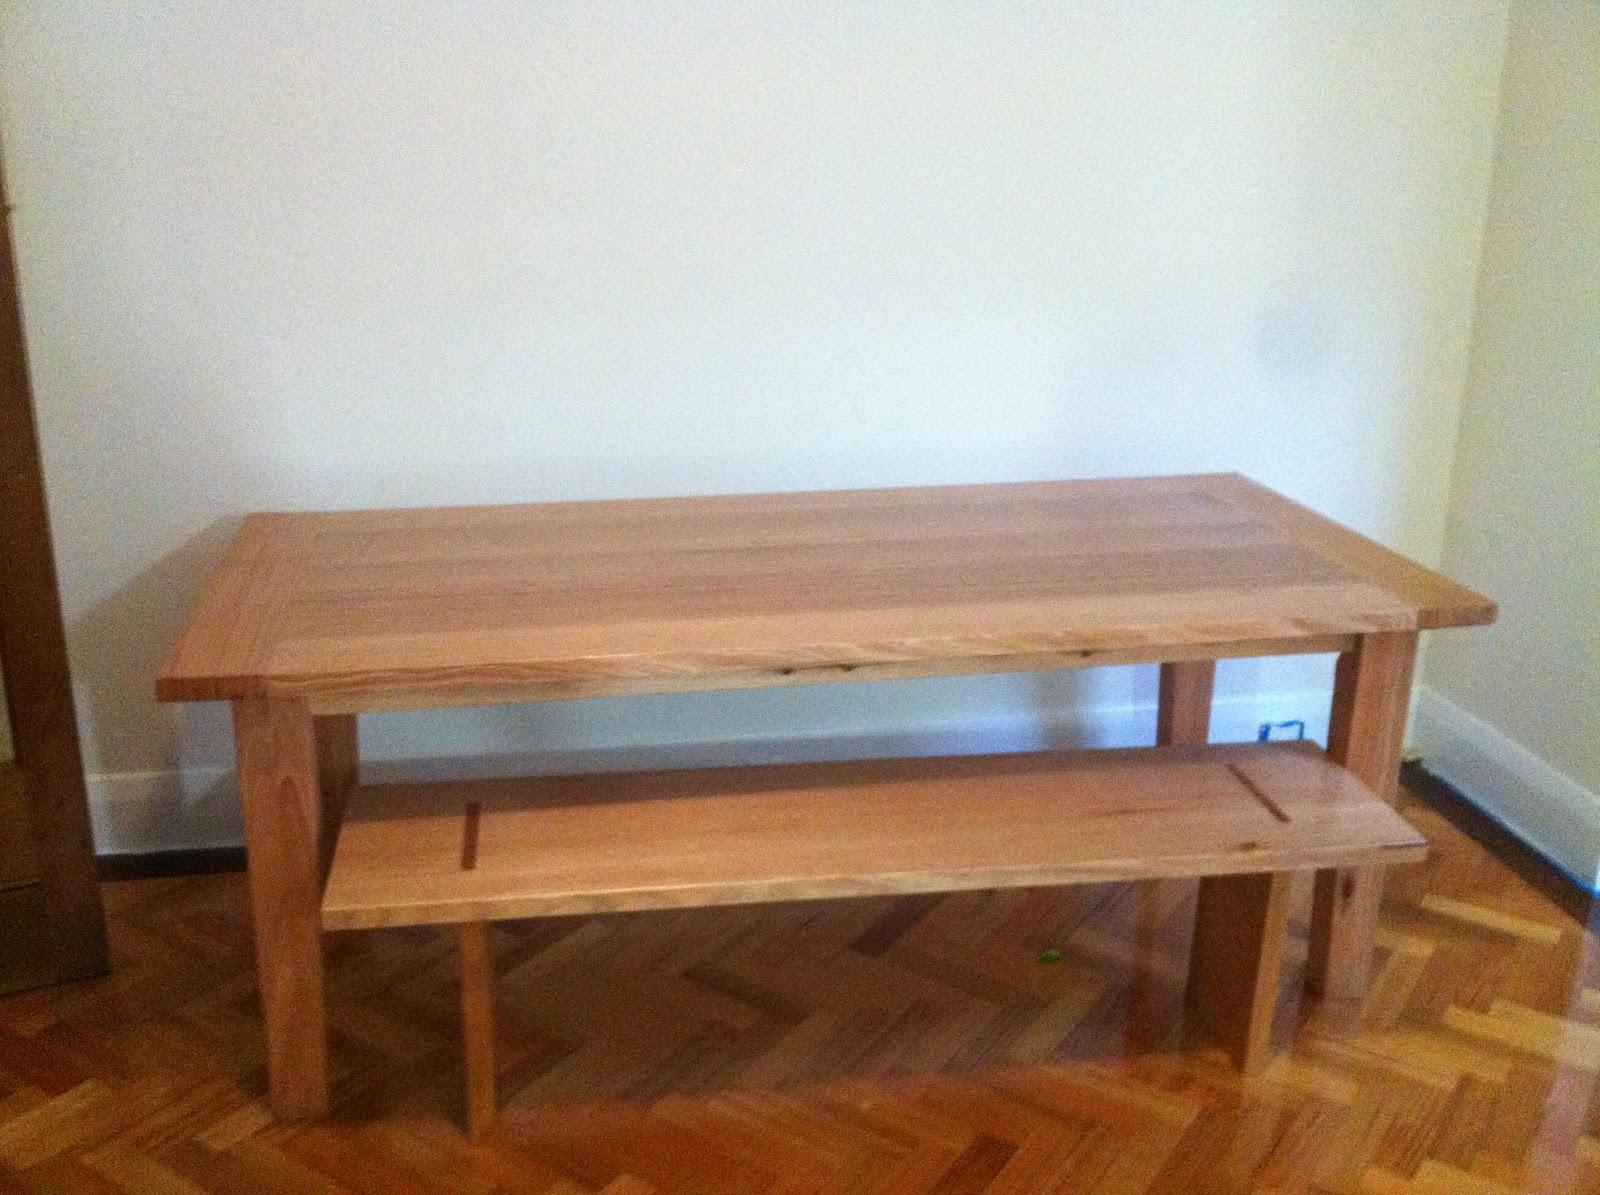 bombora custom designs farm house style dining table. Black Bedroom Furniture Sets. Home Design Ideas